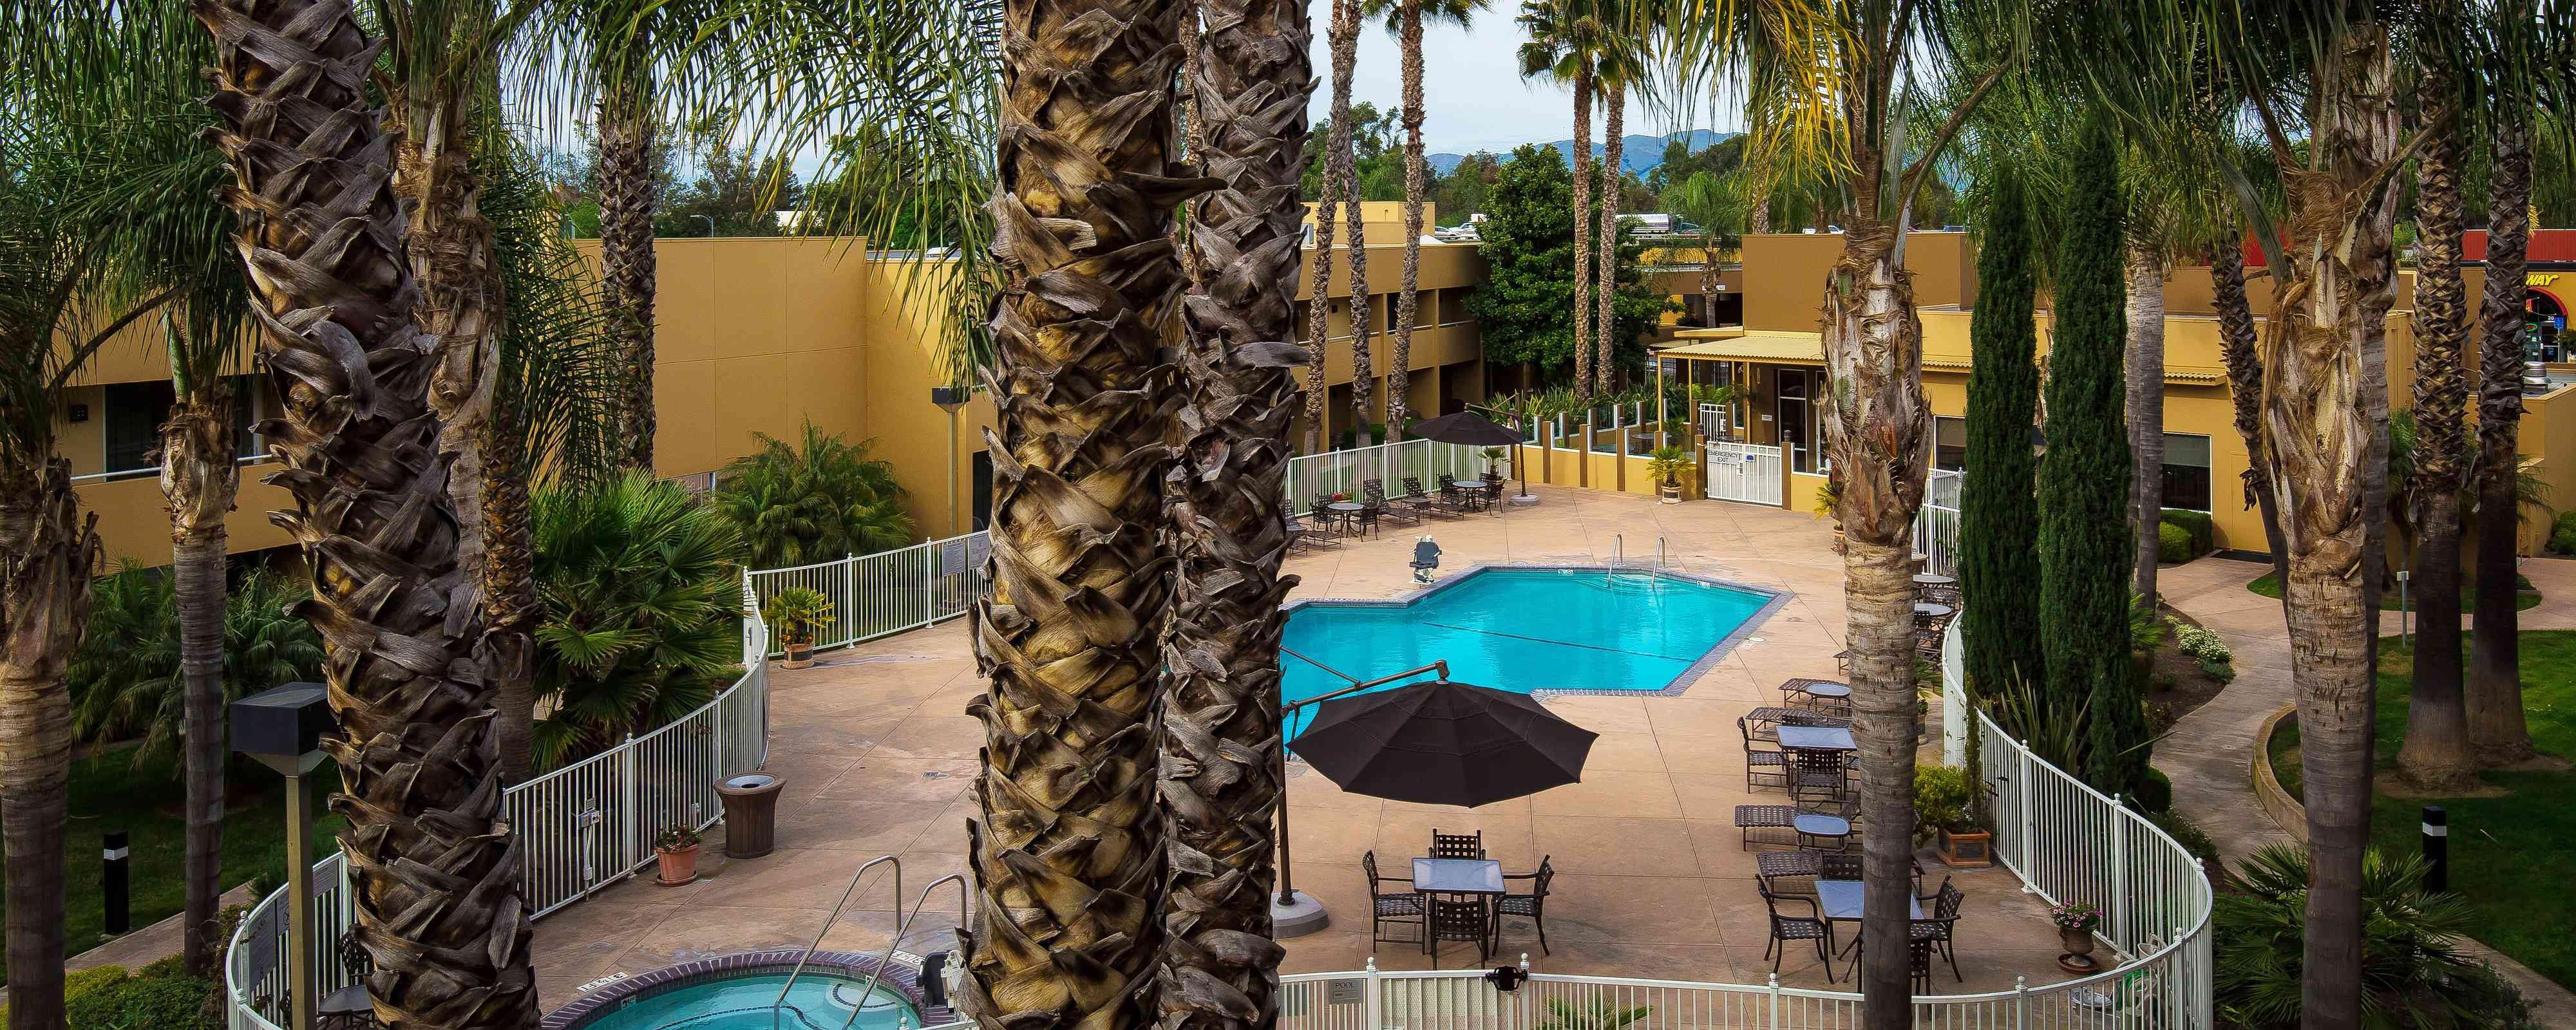 San Jose Airport Hotels | Fairfield Inn & Suites San Jose Airport